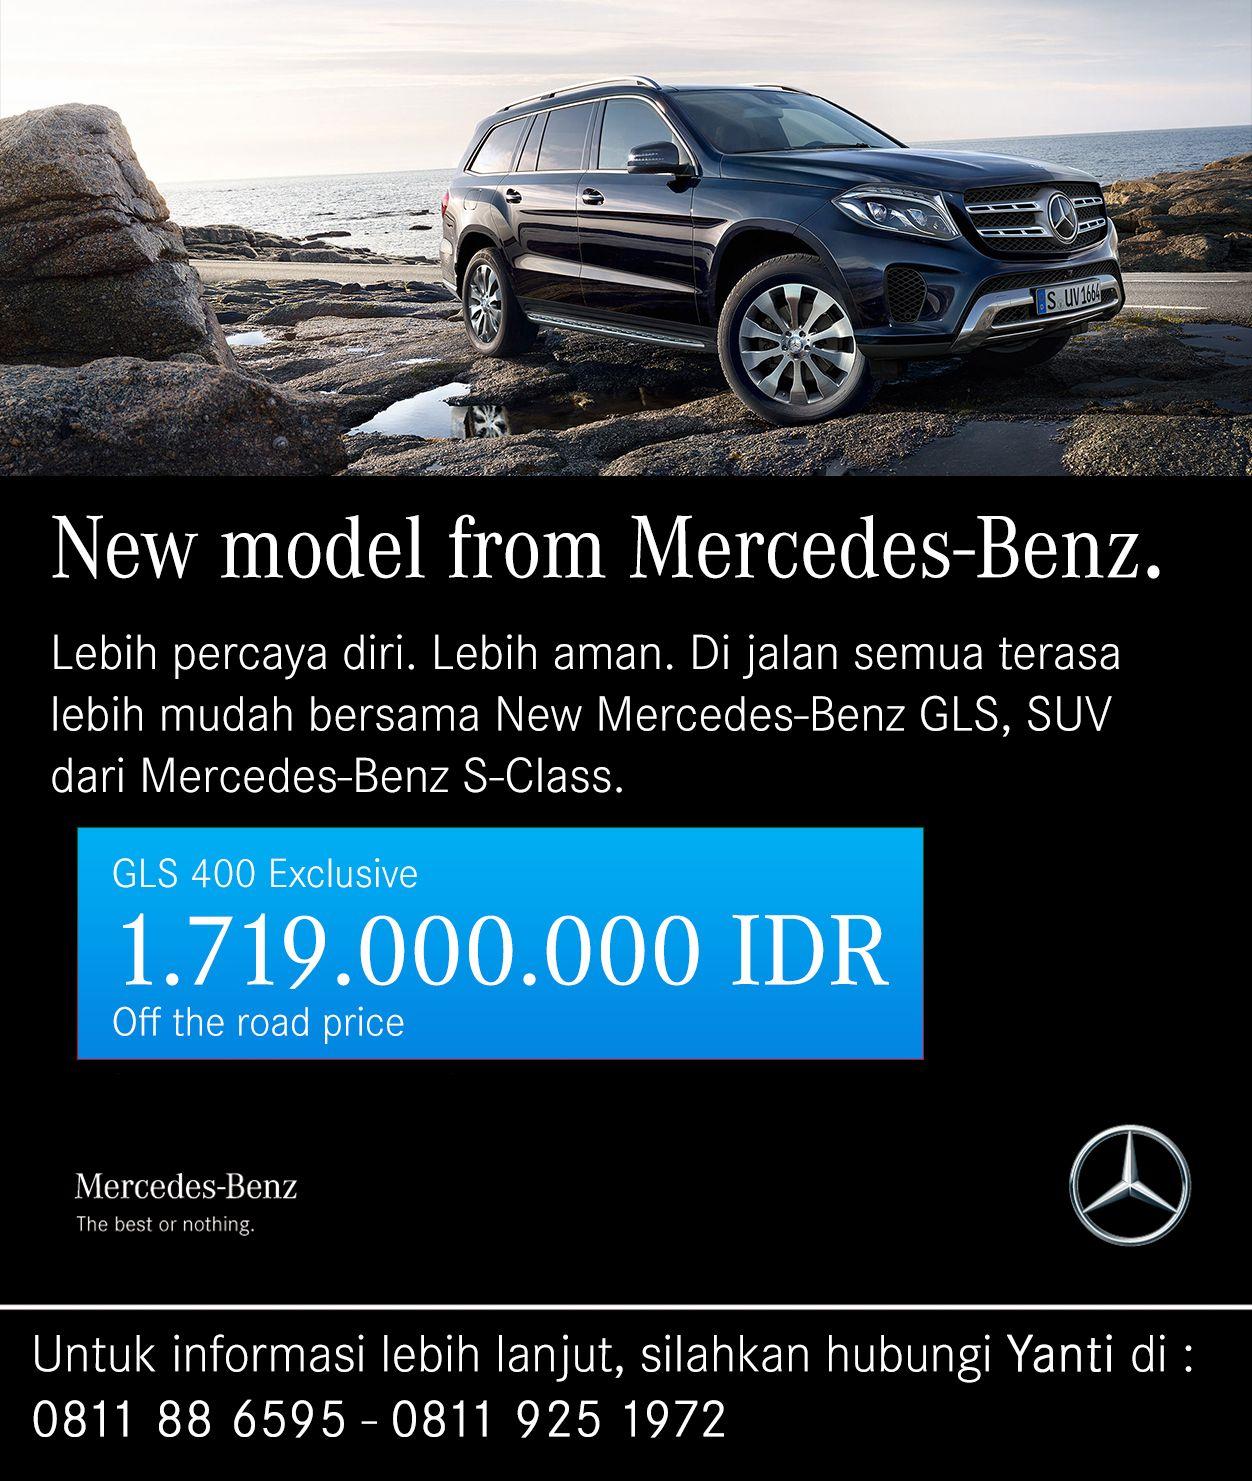 Spesifikasi Singkat Mercedes-Benz GLS 400 Exclusive